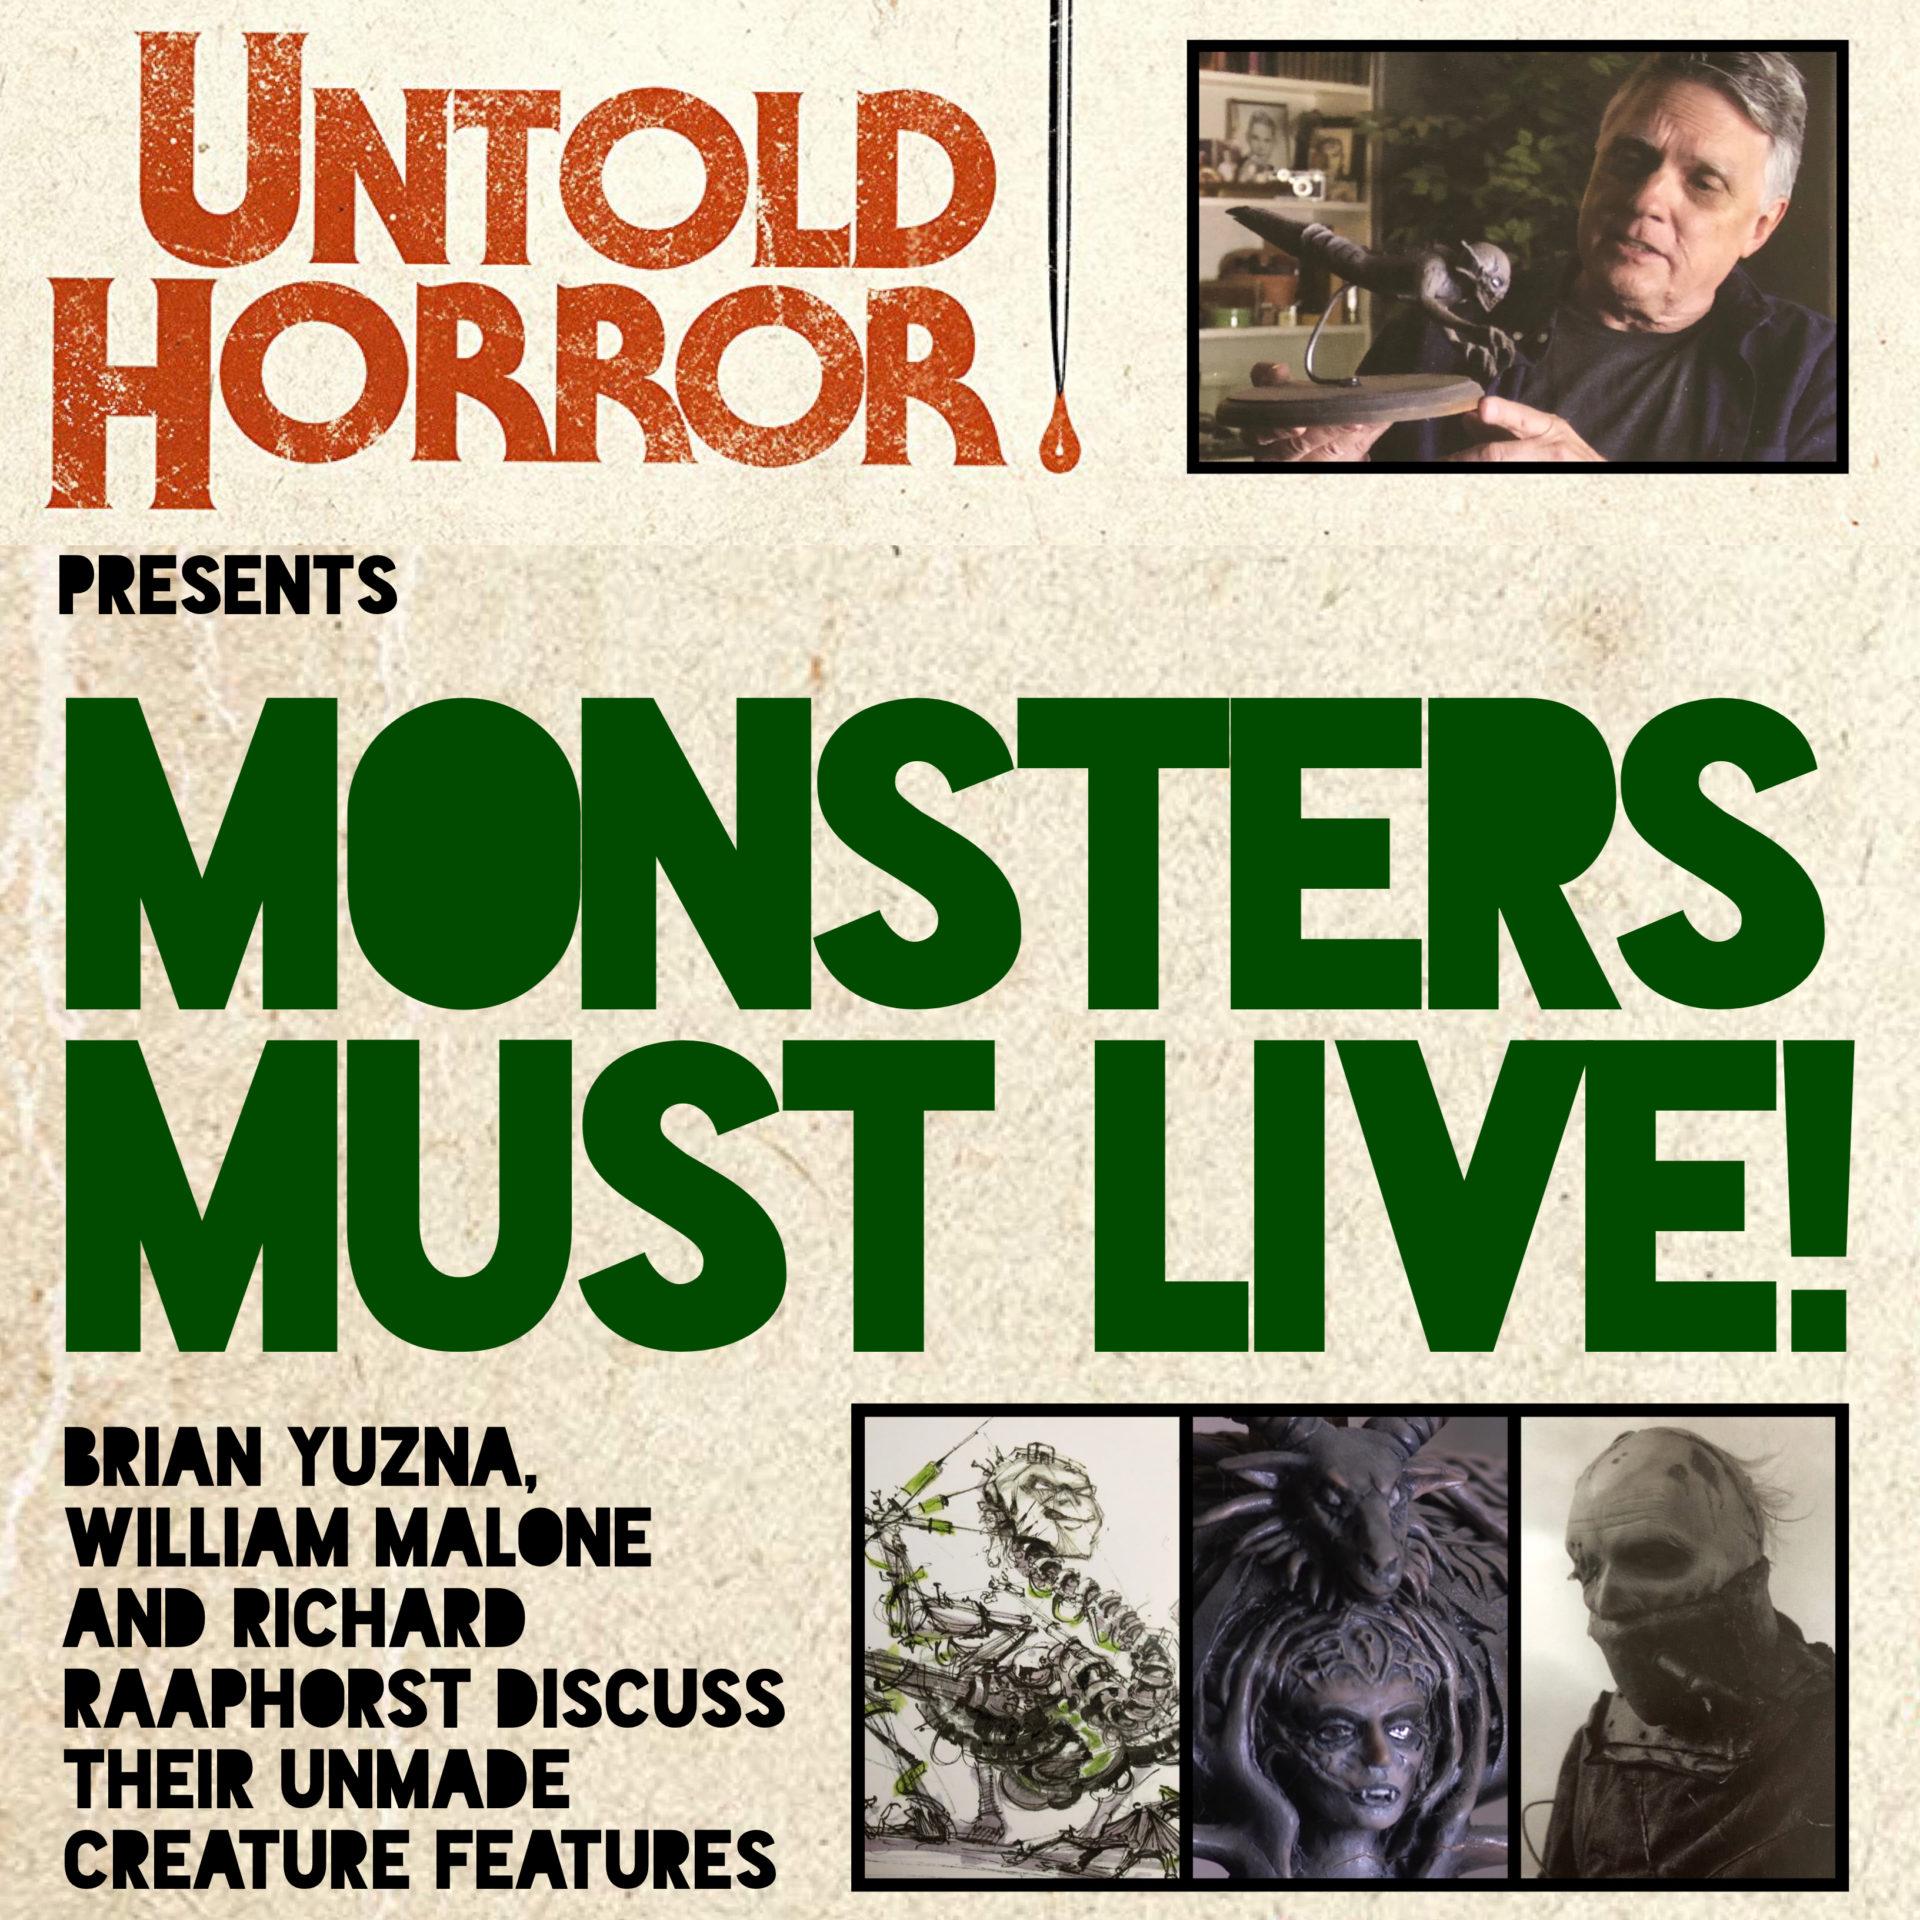 Untold horror monsters affiche film